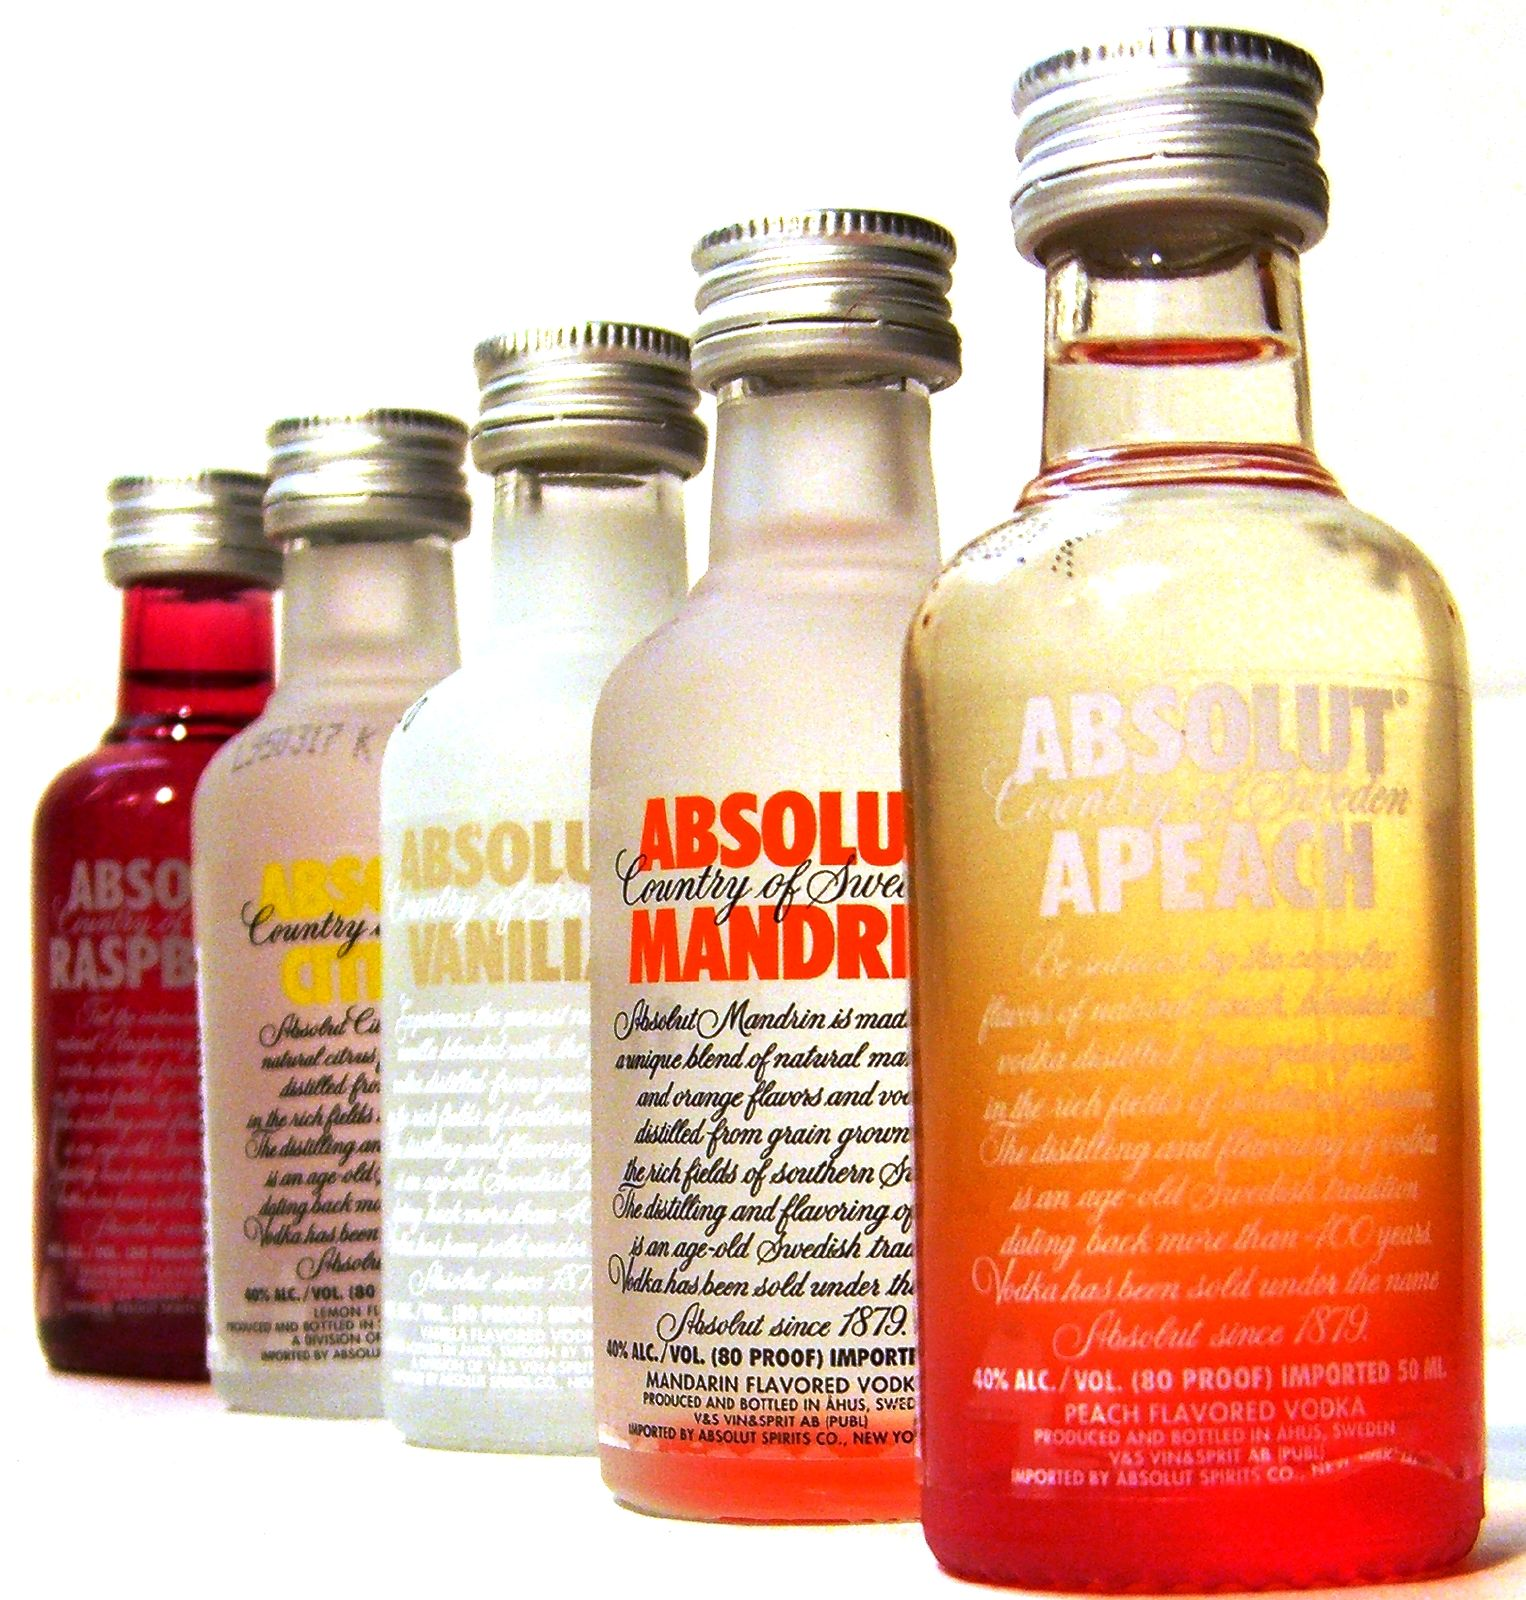 http://upload.wikimedia.org/wikipedia/commons/f/f6/More_Absolut_vodka.jpg